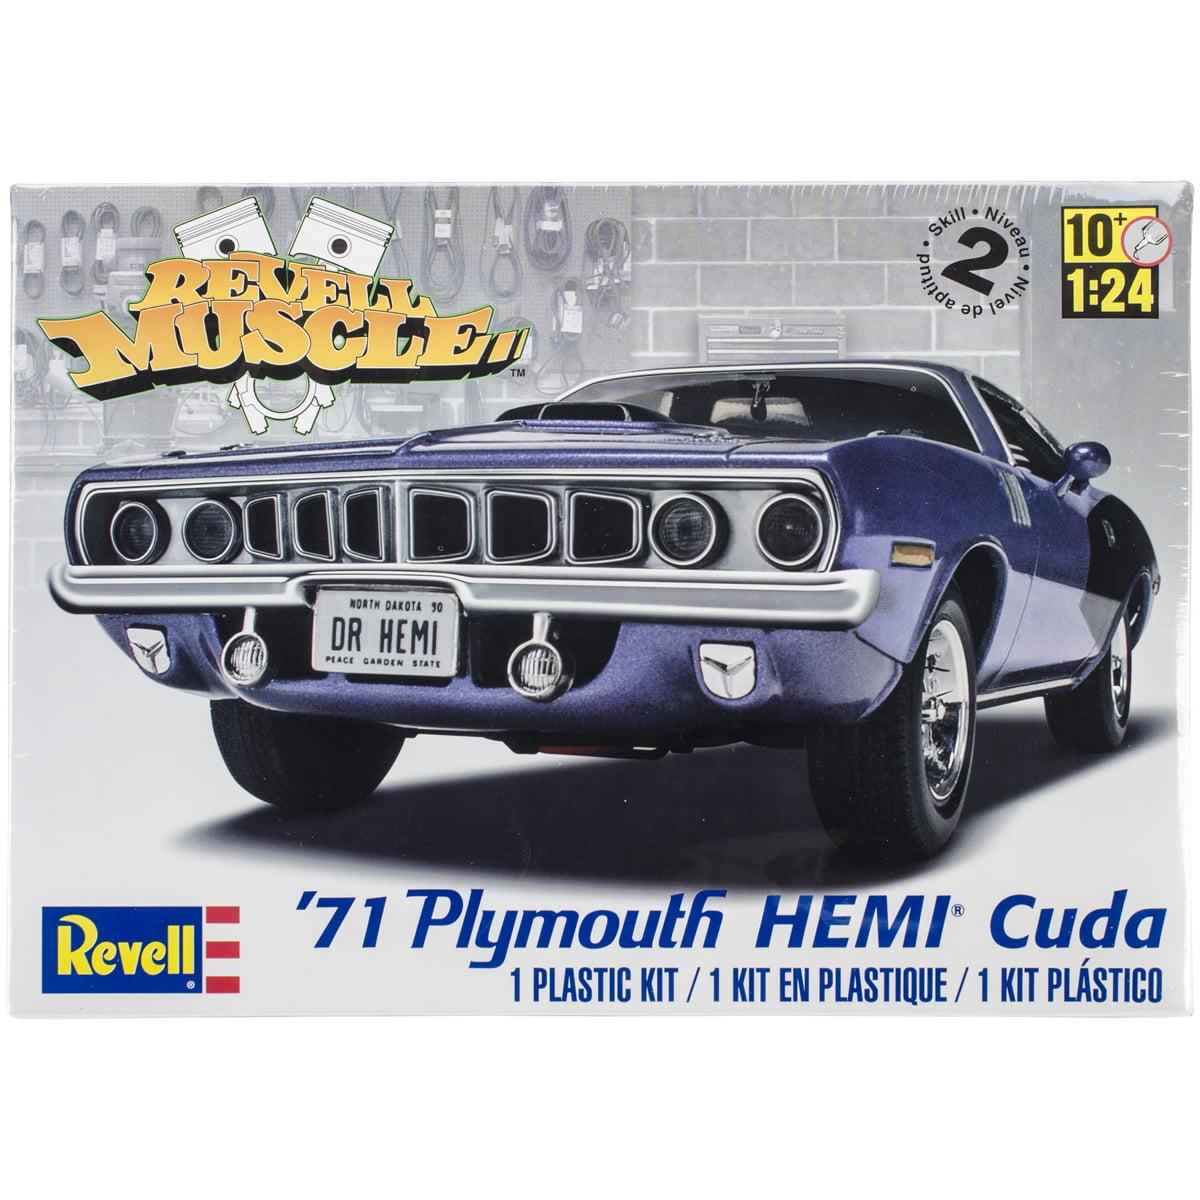 Plastic Model Kit '71 Plymouth Hemi 'Cuda Hardtop 1:25 by Revell